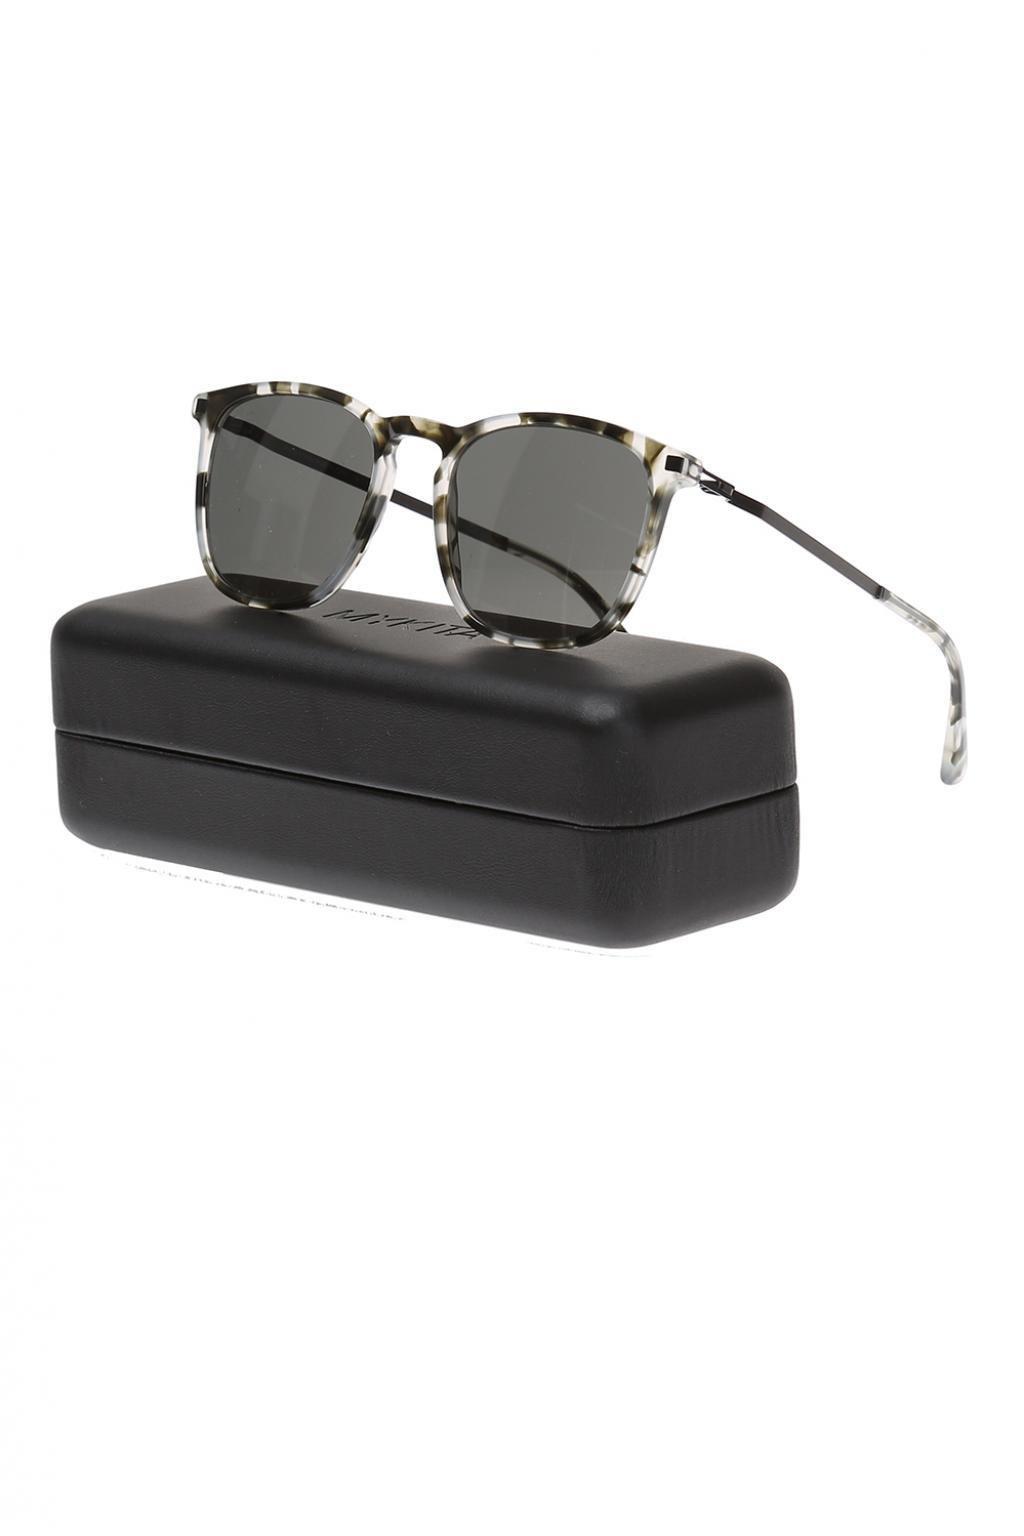 8874d448dead Lyst - Mykita  atka  Sunglasses in Black